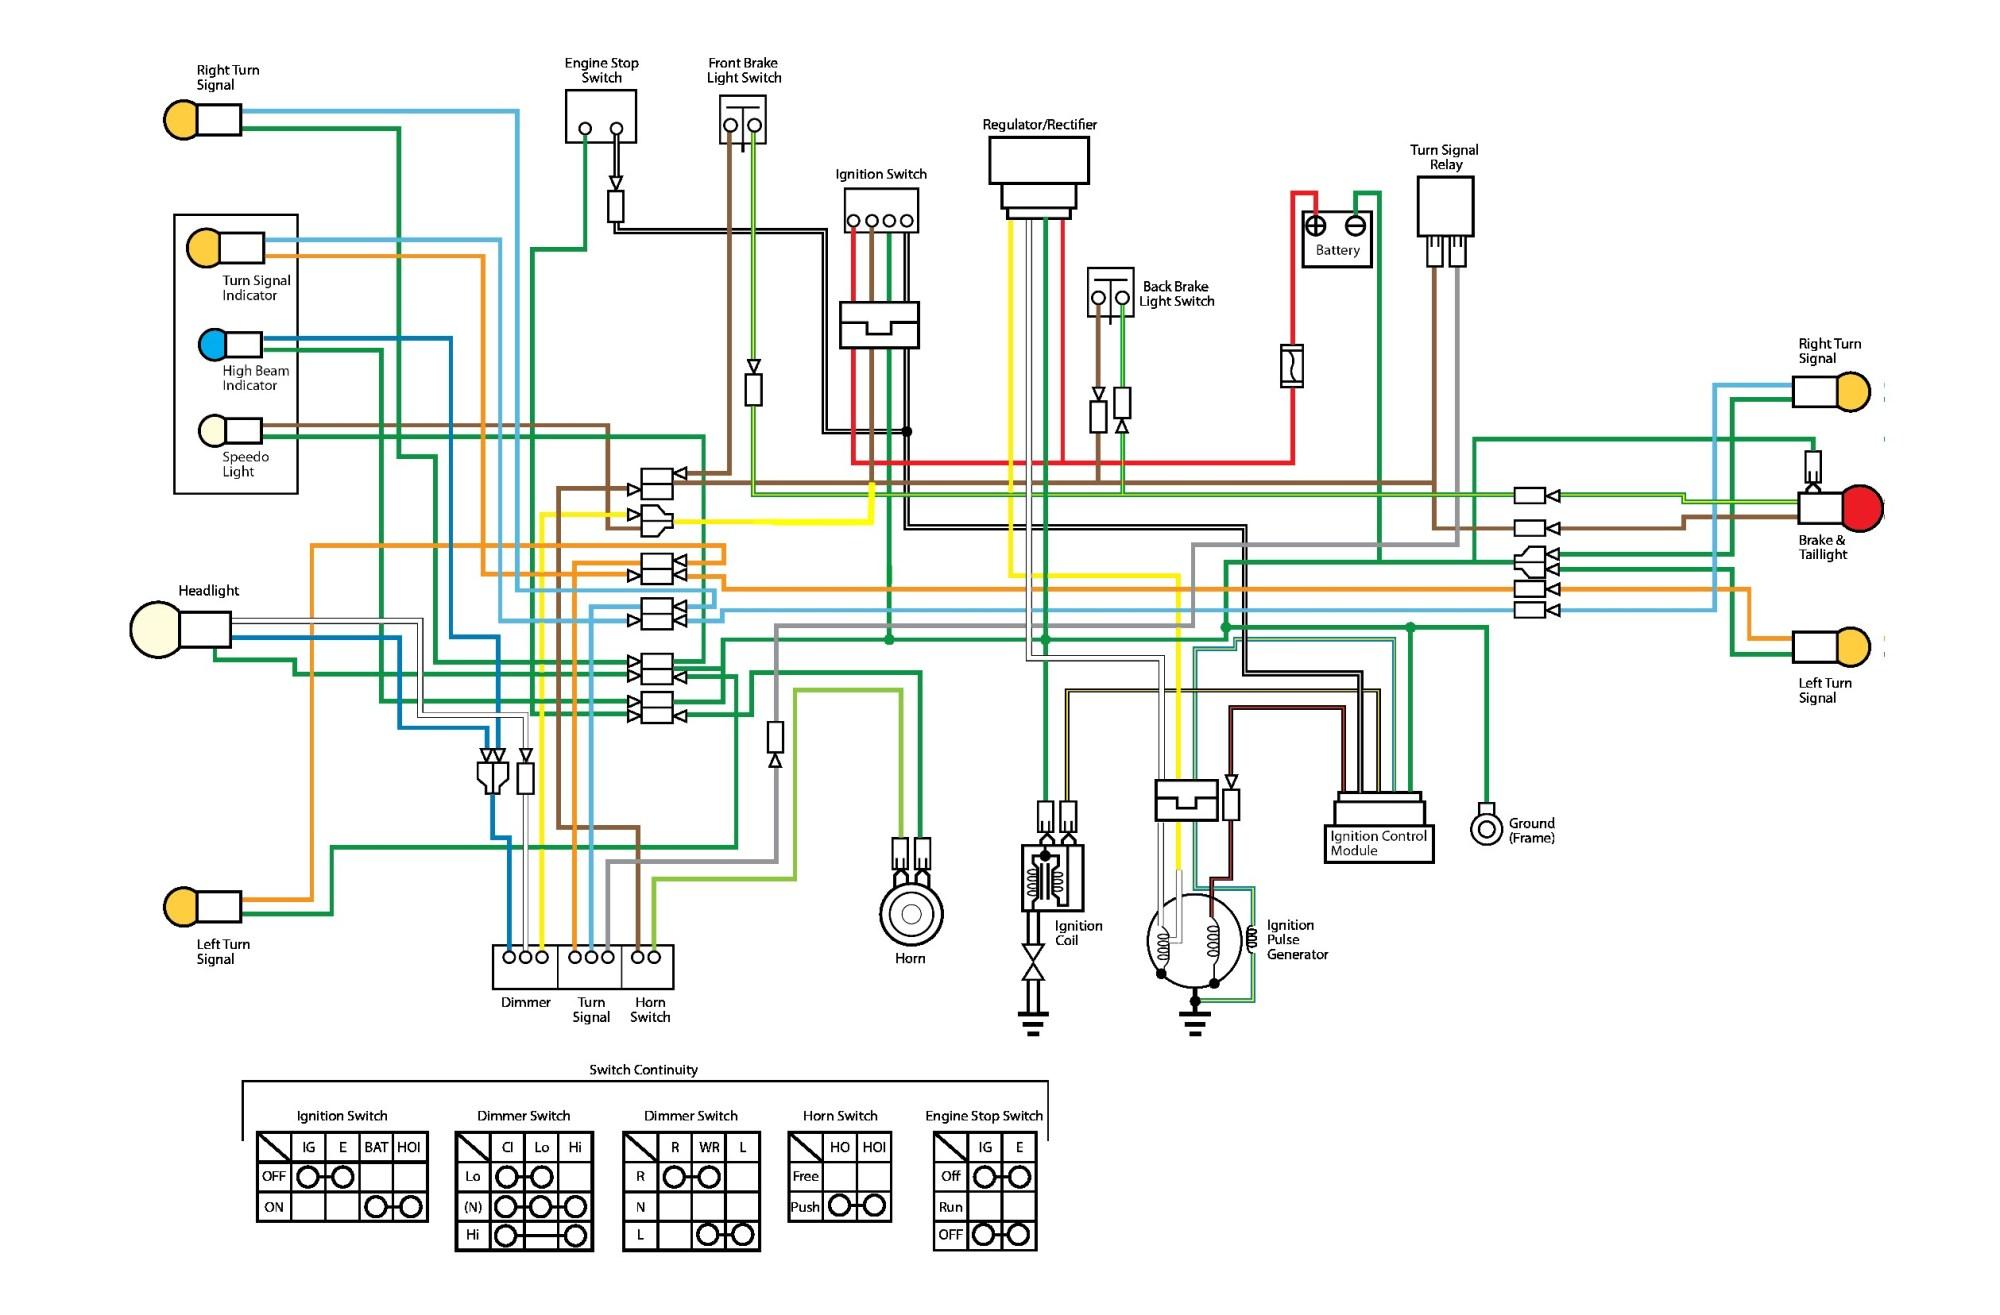 hight resolution of honda wave 125 engine diagram gy6 150cc engine diagram gy6 ignition wiring diagram 150cc gy6 engine wiring diagram